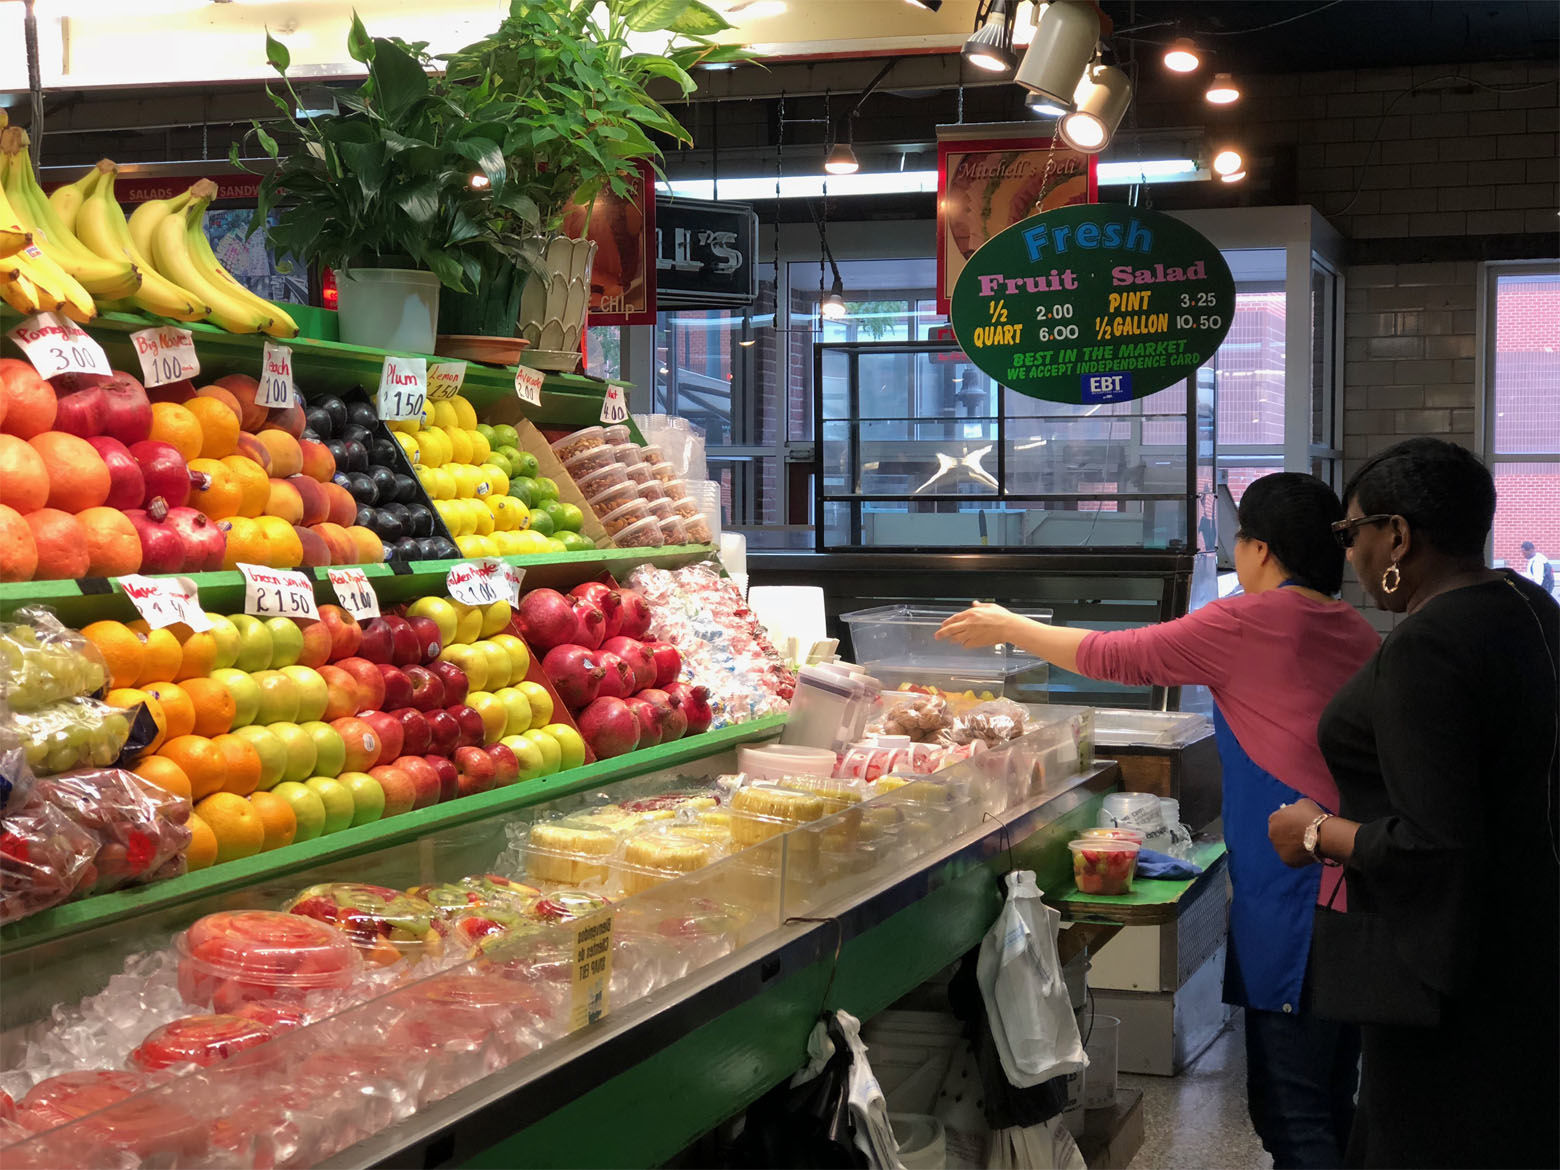 From fresh fish to fresh fruit, Lexington Market has it. (WTOP/Kate Ryan)